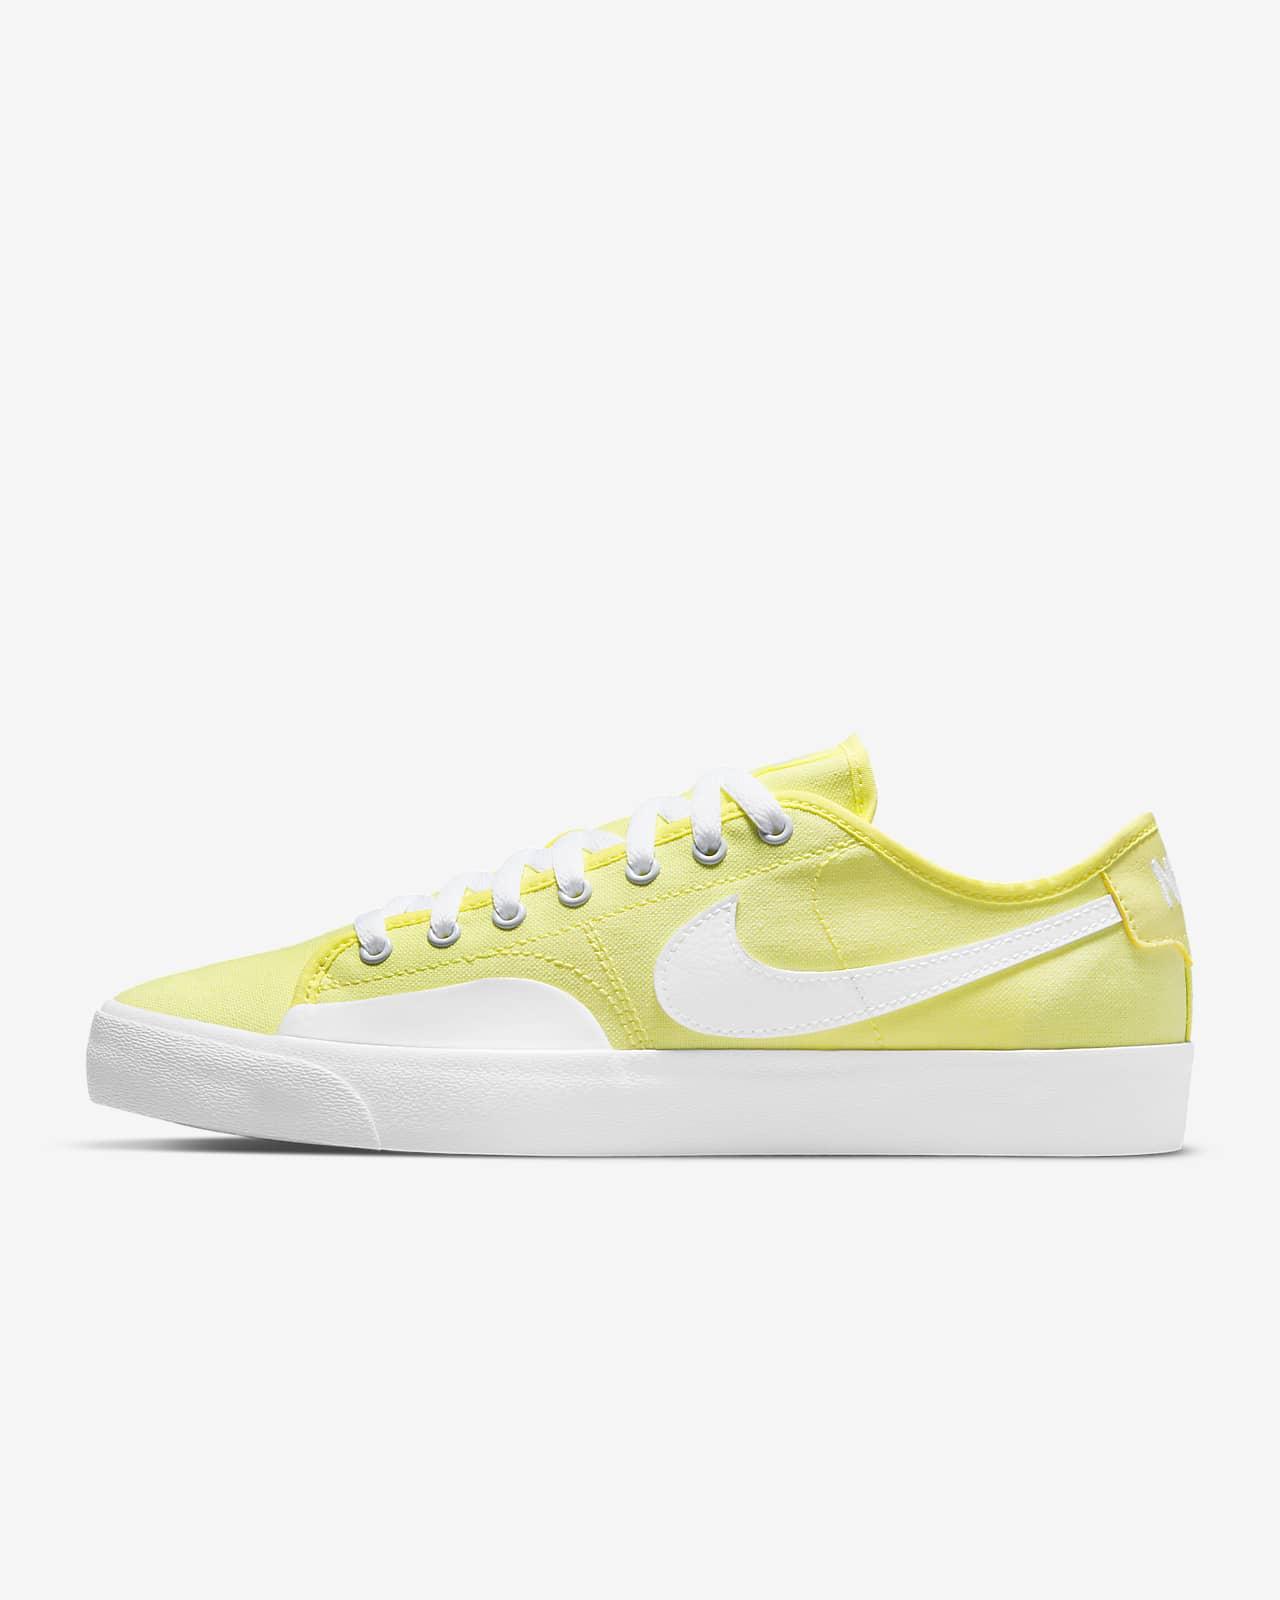 Calzado de skateboarding Nike SB BLZR Court